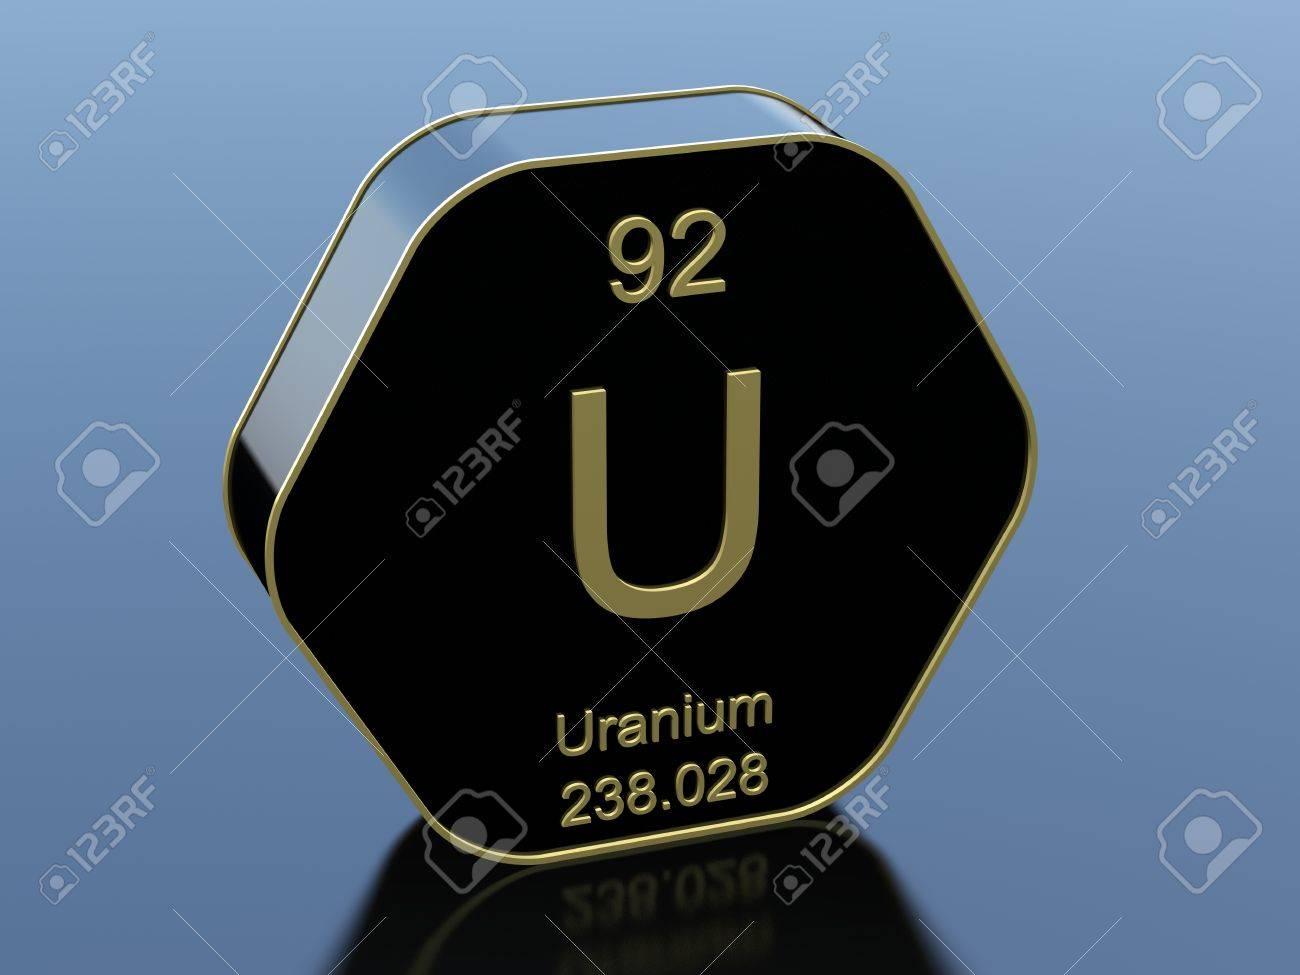 Uranium element symbol on hexagonal black icon stock photo picture uranium element symbol on hexagonal black icon stock photo 82240201 buycottarizona Images